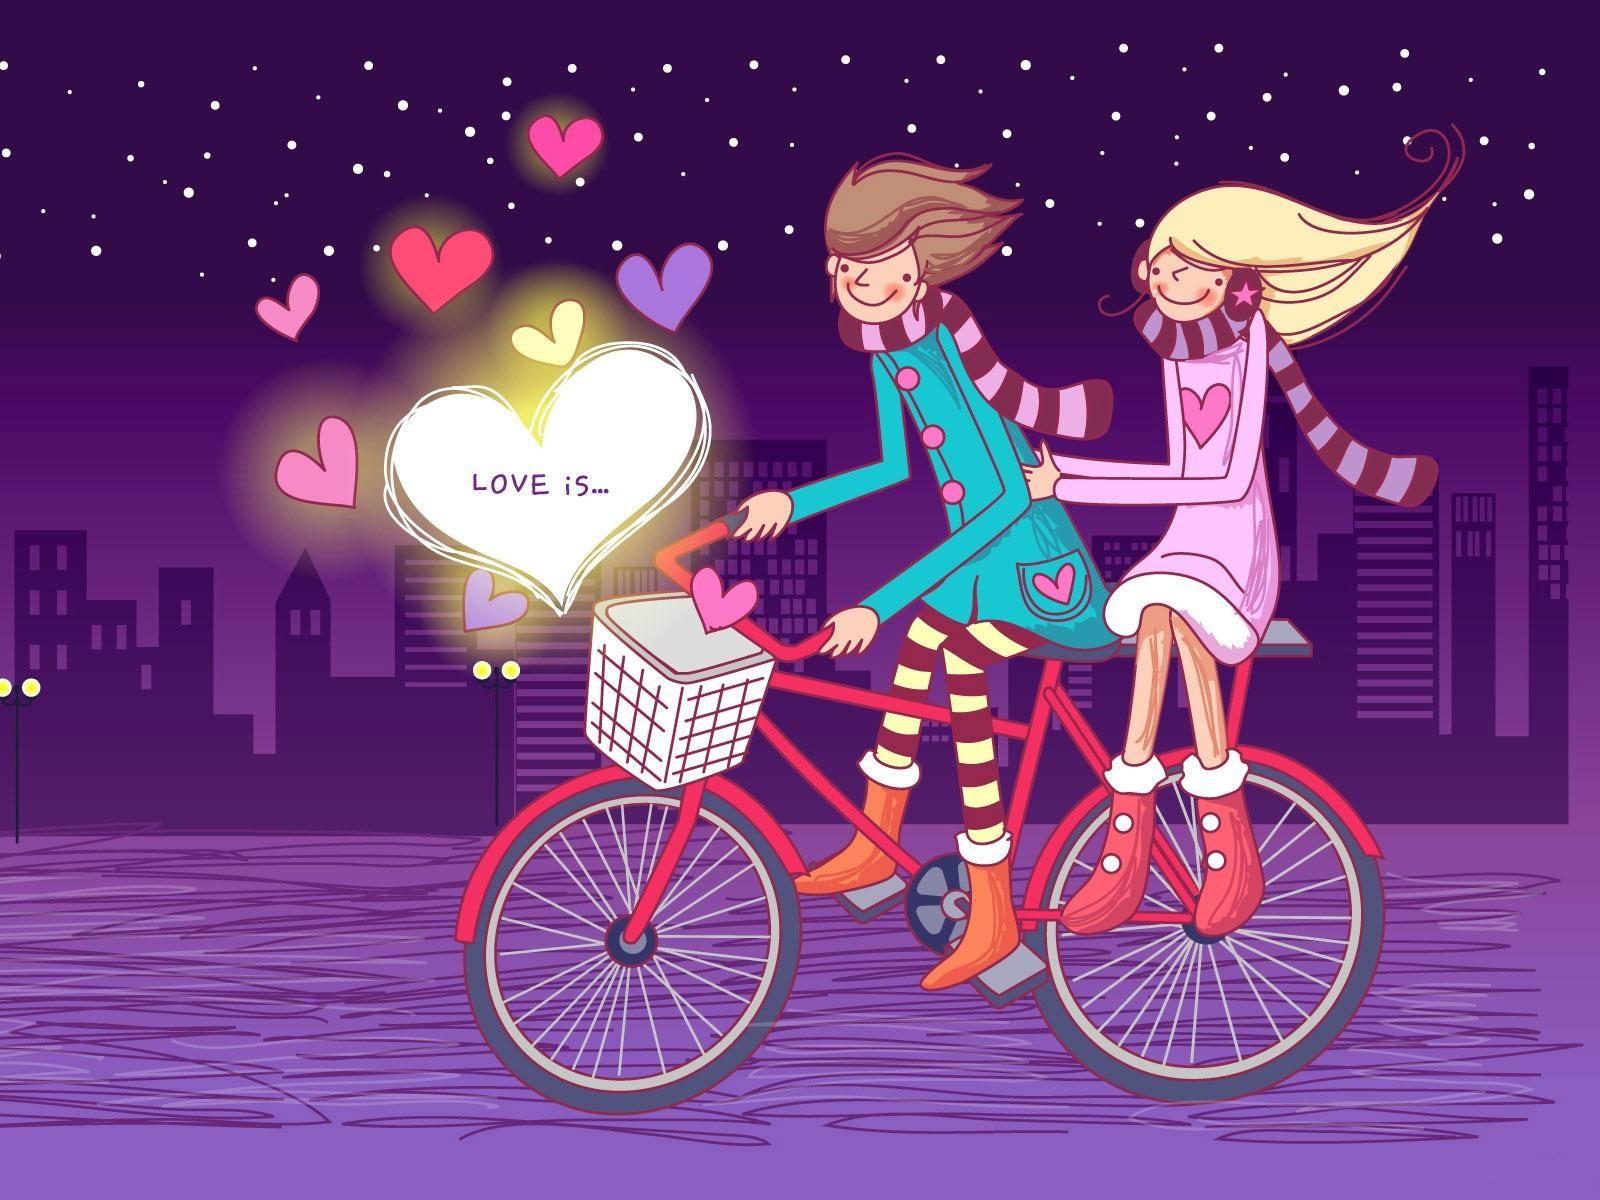 Download Wallpaper High Quality Romantic - 54f7dbf9fbc2f5971097086187f58e51  Photograph_59894.jpg